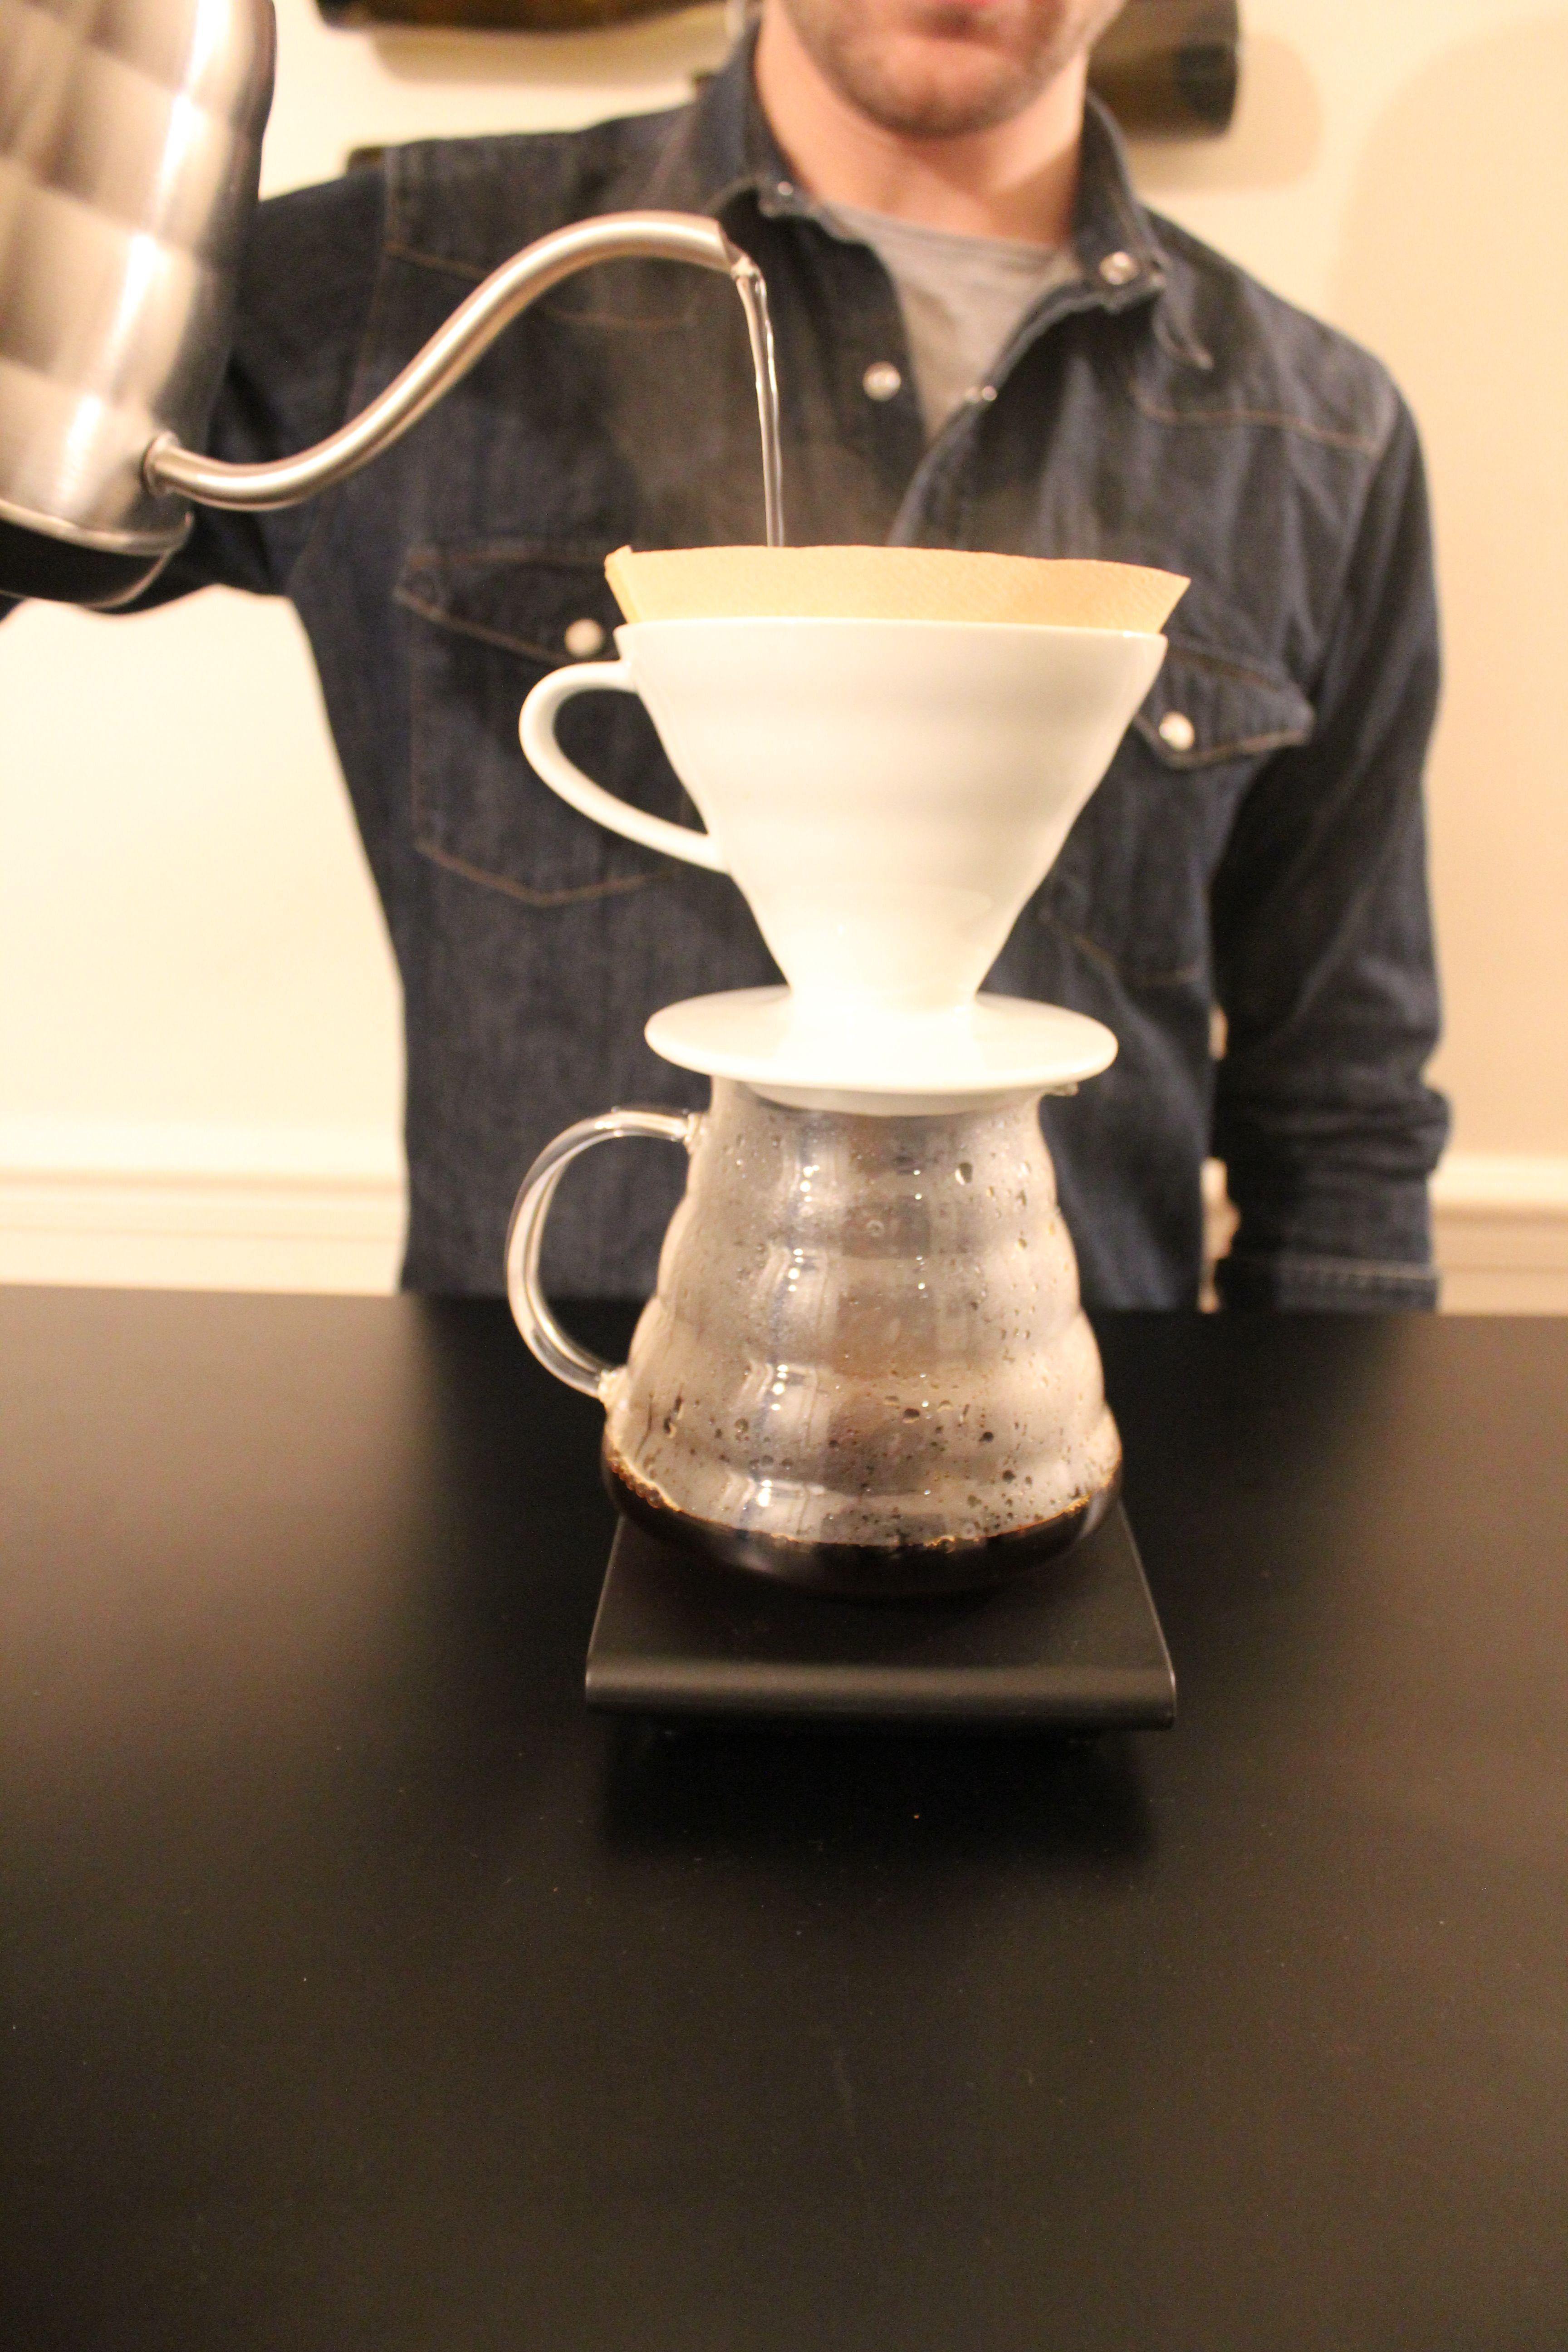 Le V Le Café Filtre Moderne Porte Filtre Tasses - Porte filtre café